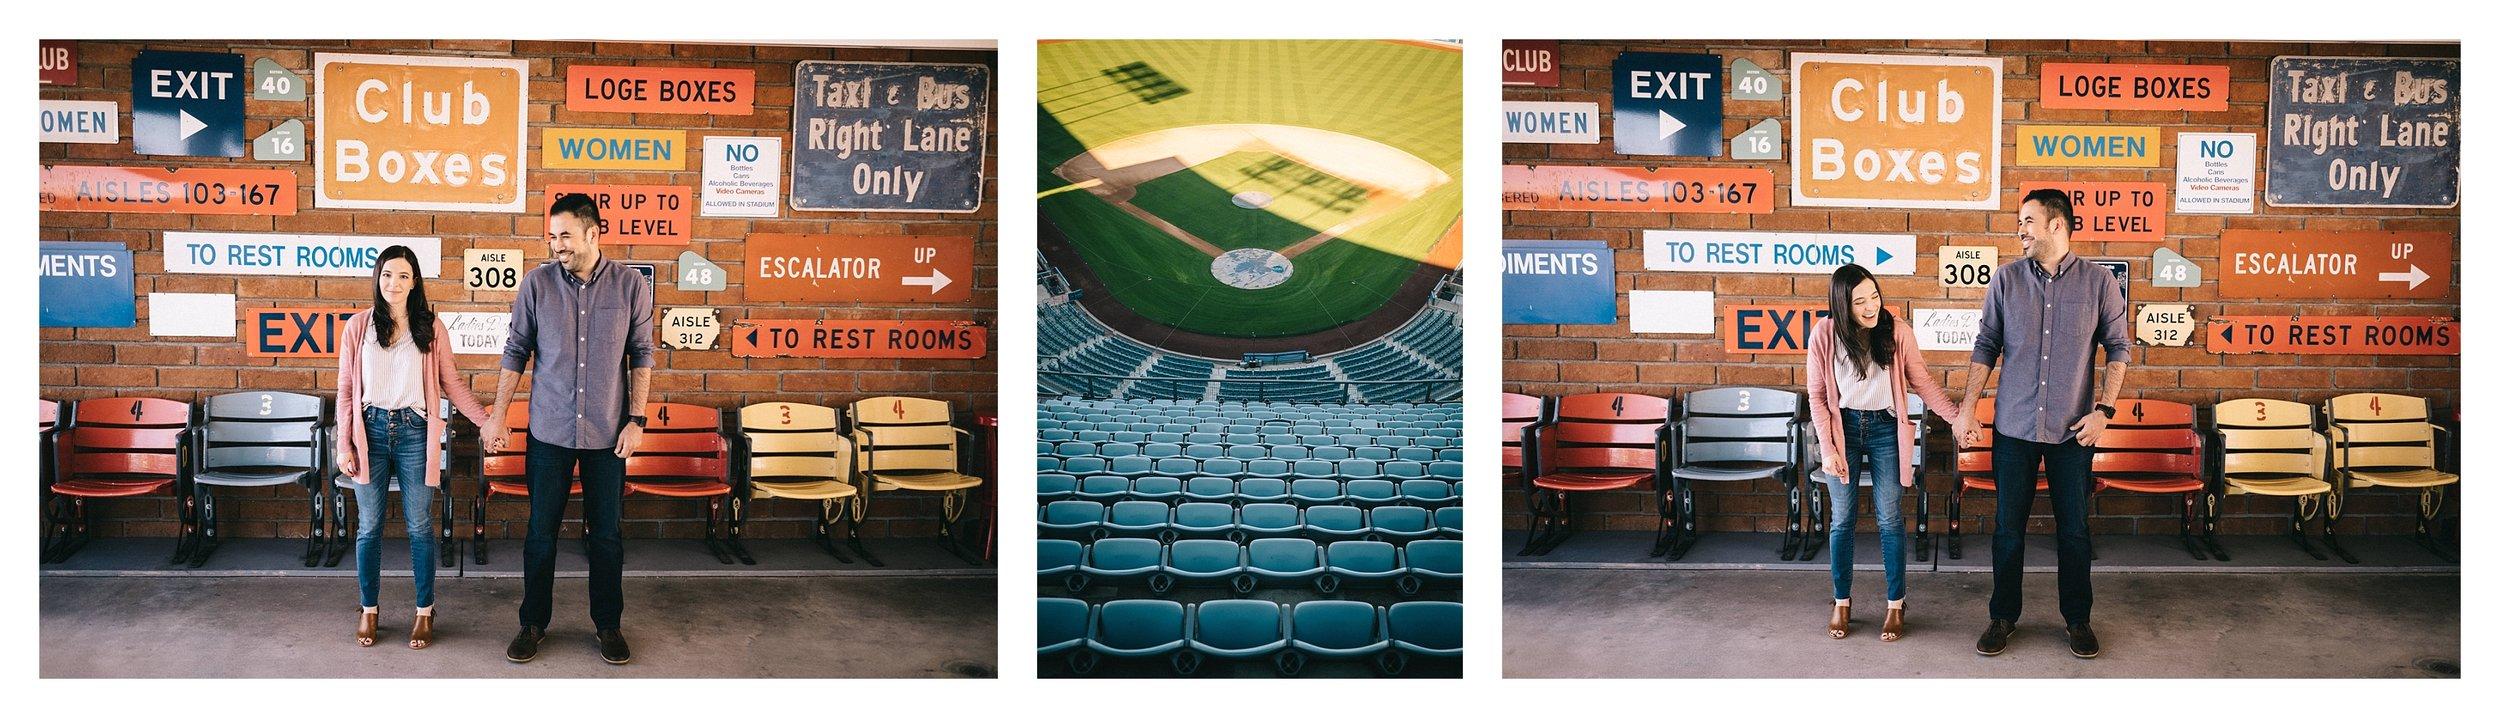 Dodger_Stadium_Engagement_Session_Nick_Mueller_Photography_5.jpg